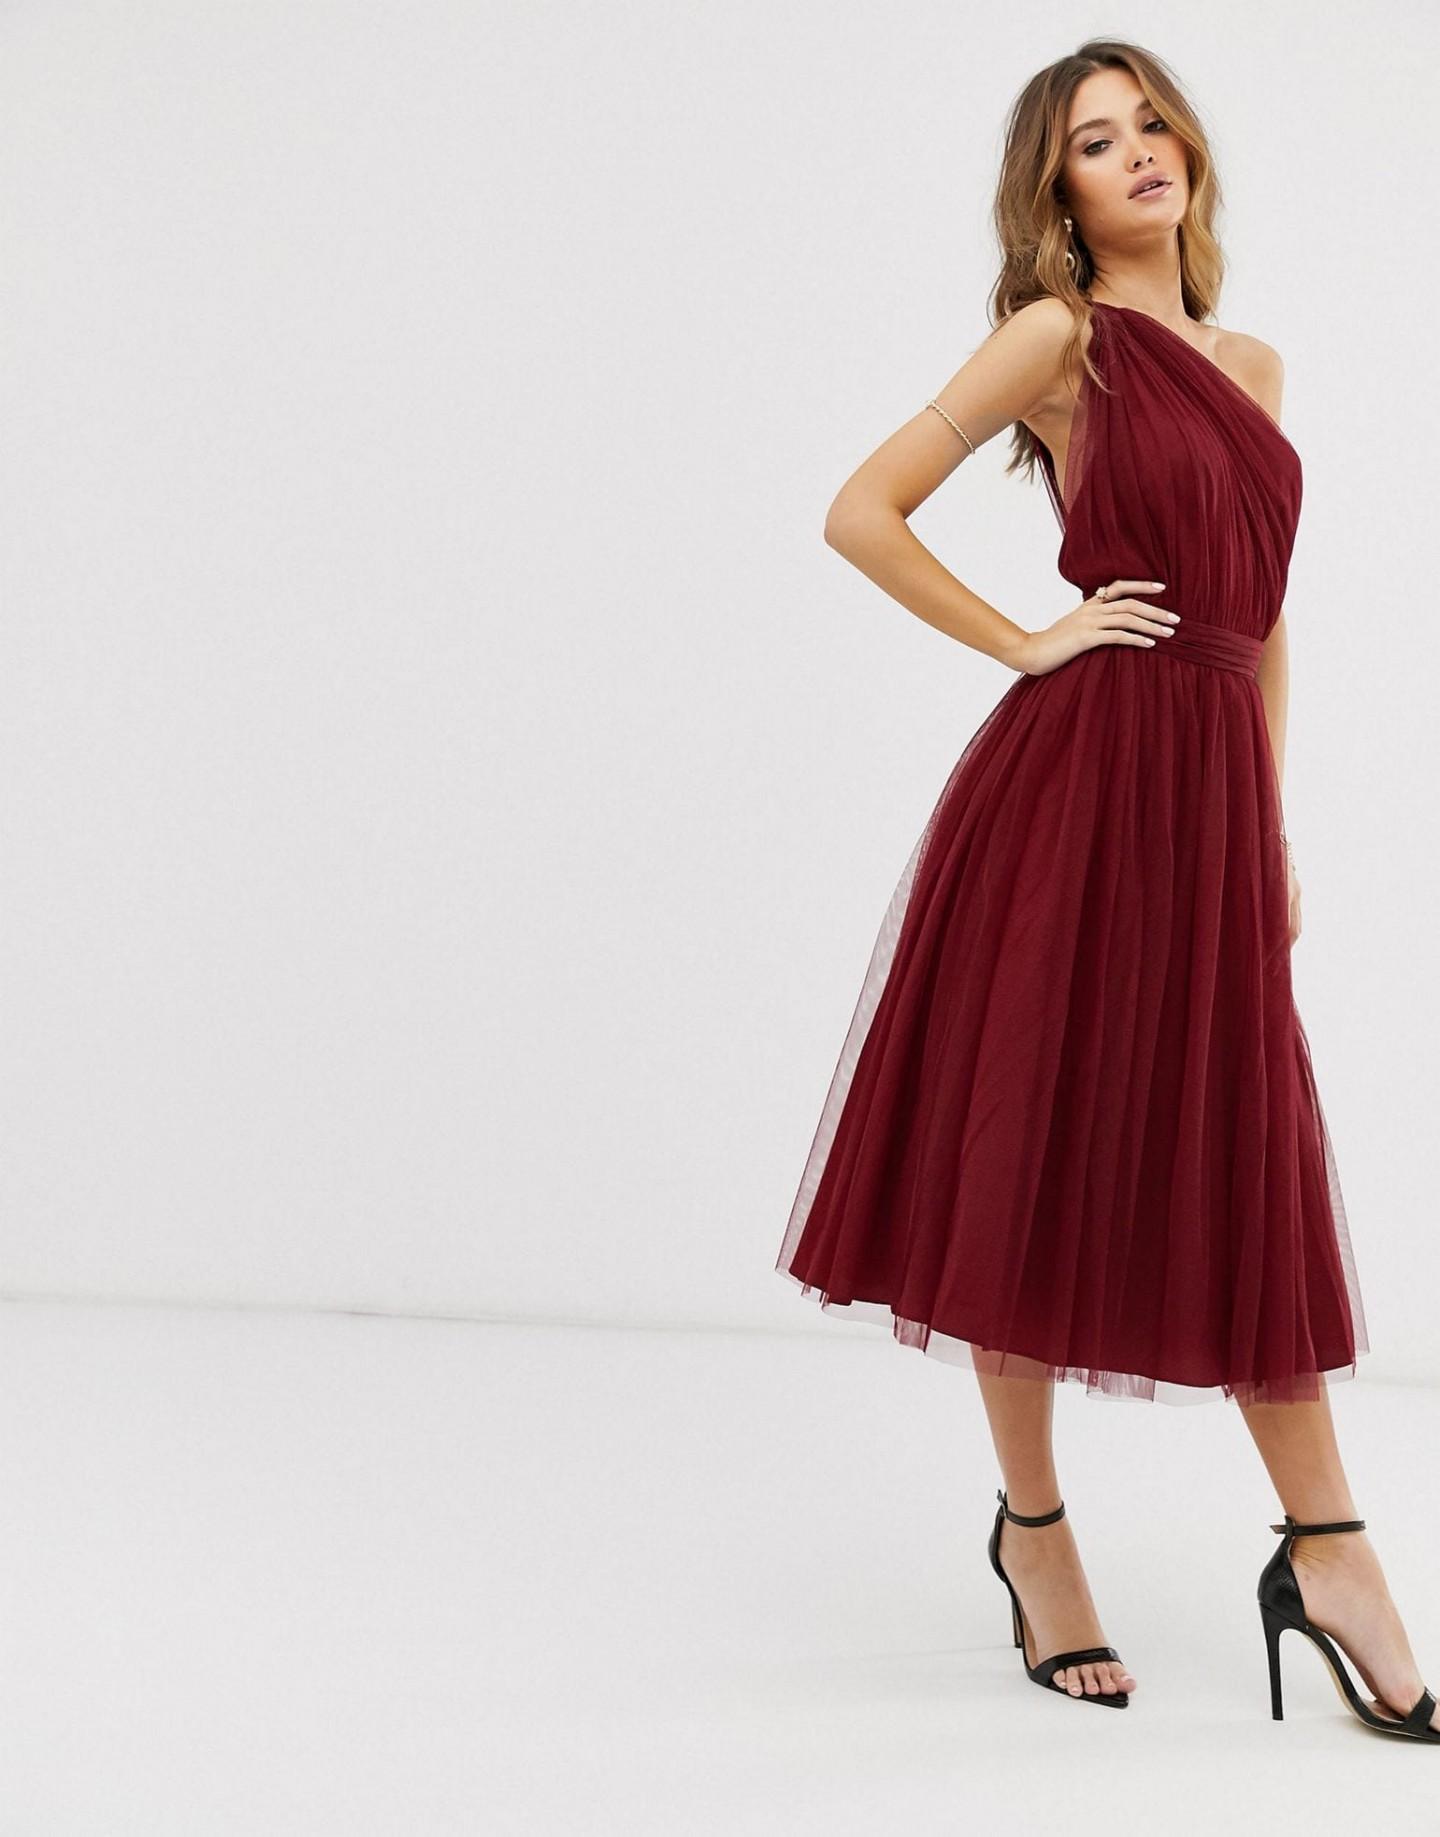 ASOS DESIGN One Shoulder Tulle Midi Dress